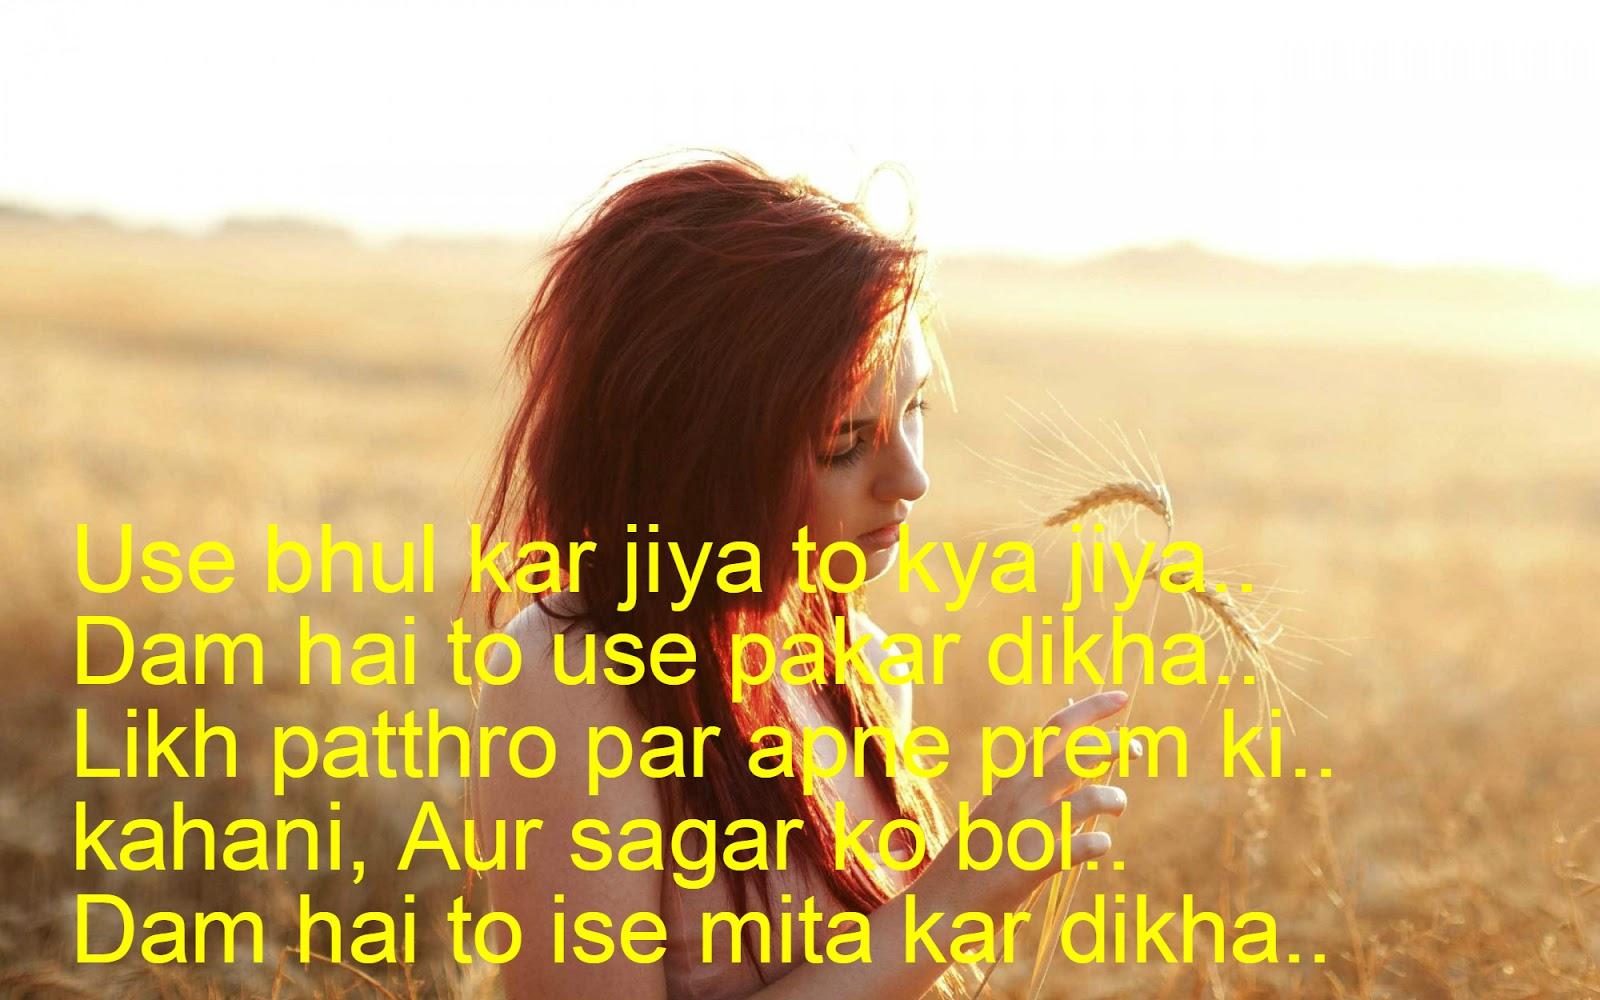 Pictures being single is my attitude p funny joke and attitude image - Use Bhul Kar Jiya To Kya Jiya Dam Hai To Use Pakr Dikha